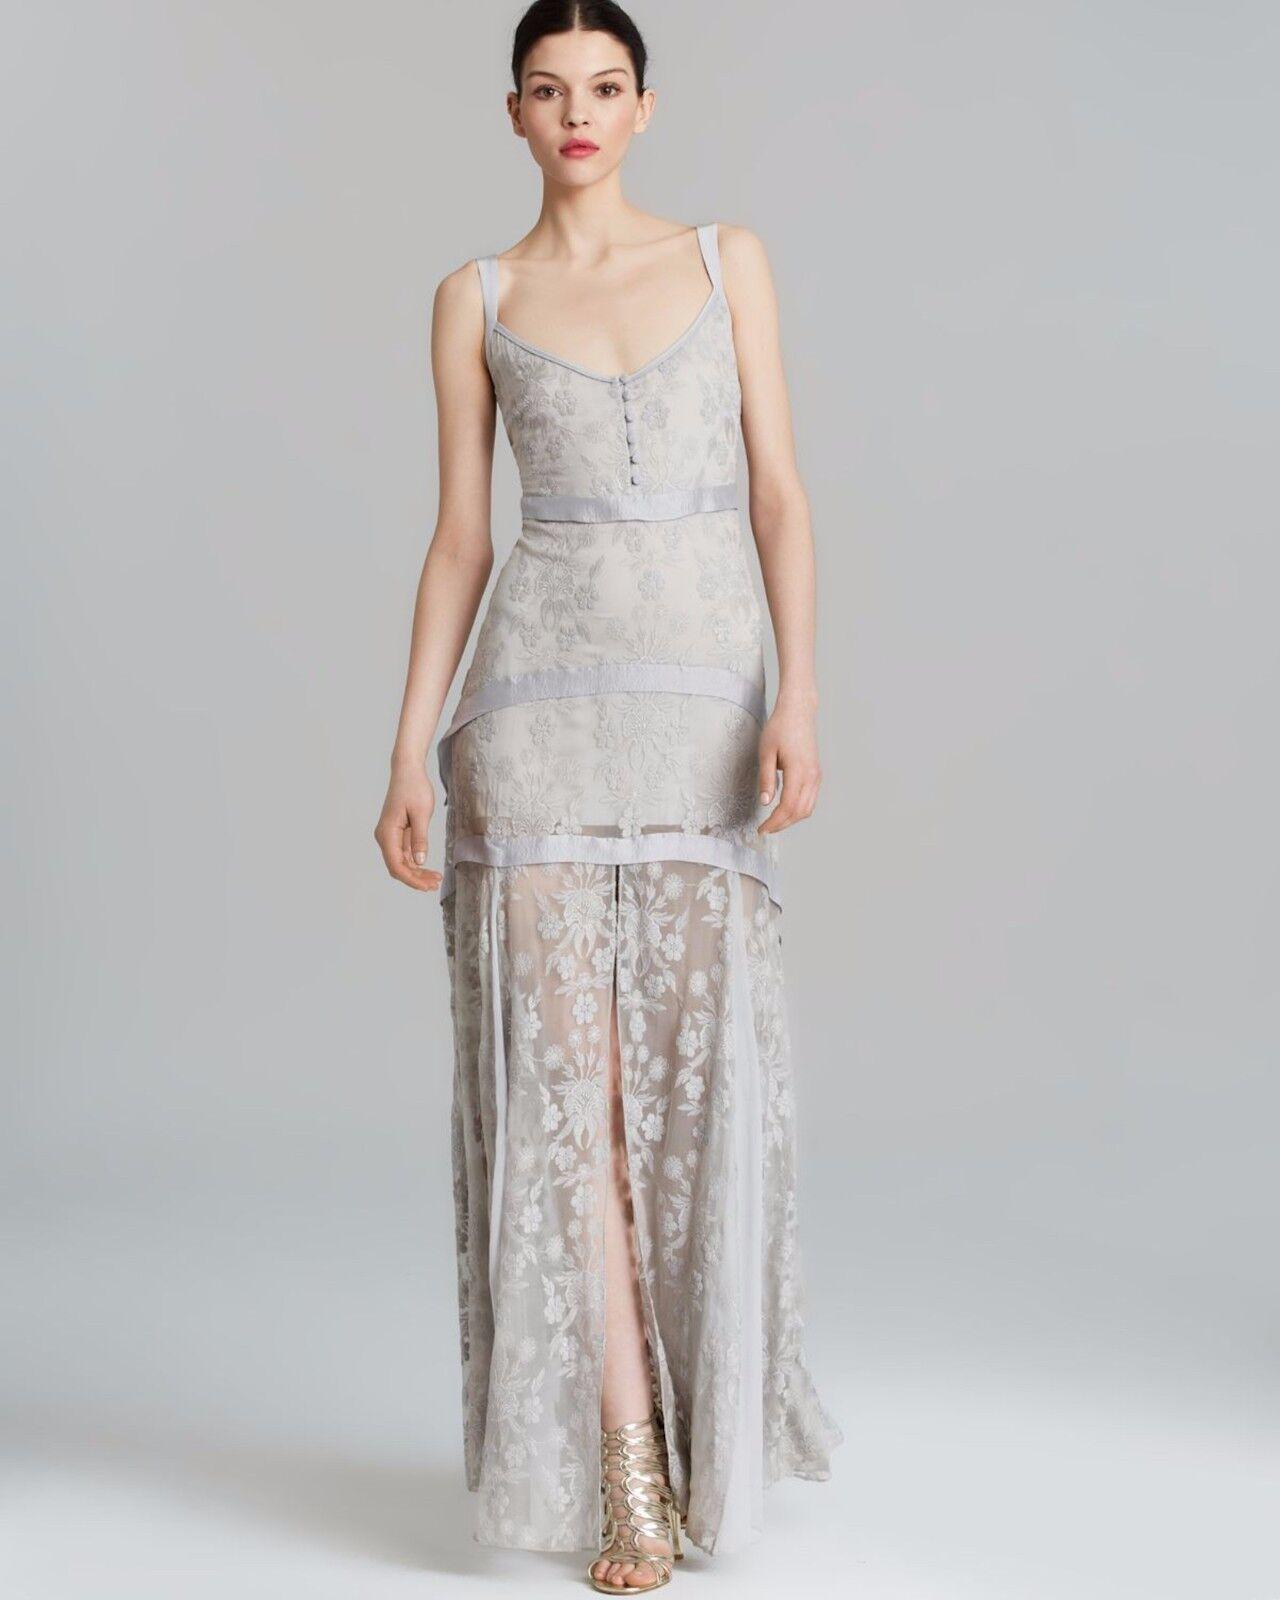 ELIZABETH & JAMES LISE PALE GREY SILK TIERED MAXI DRESS  595NWT Sz 6 Embroidered